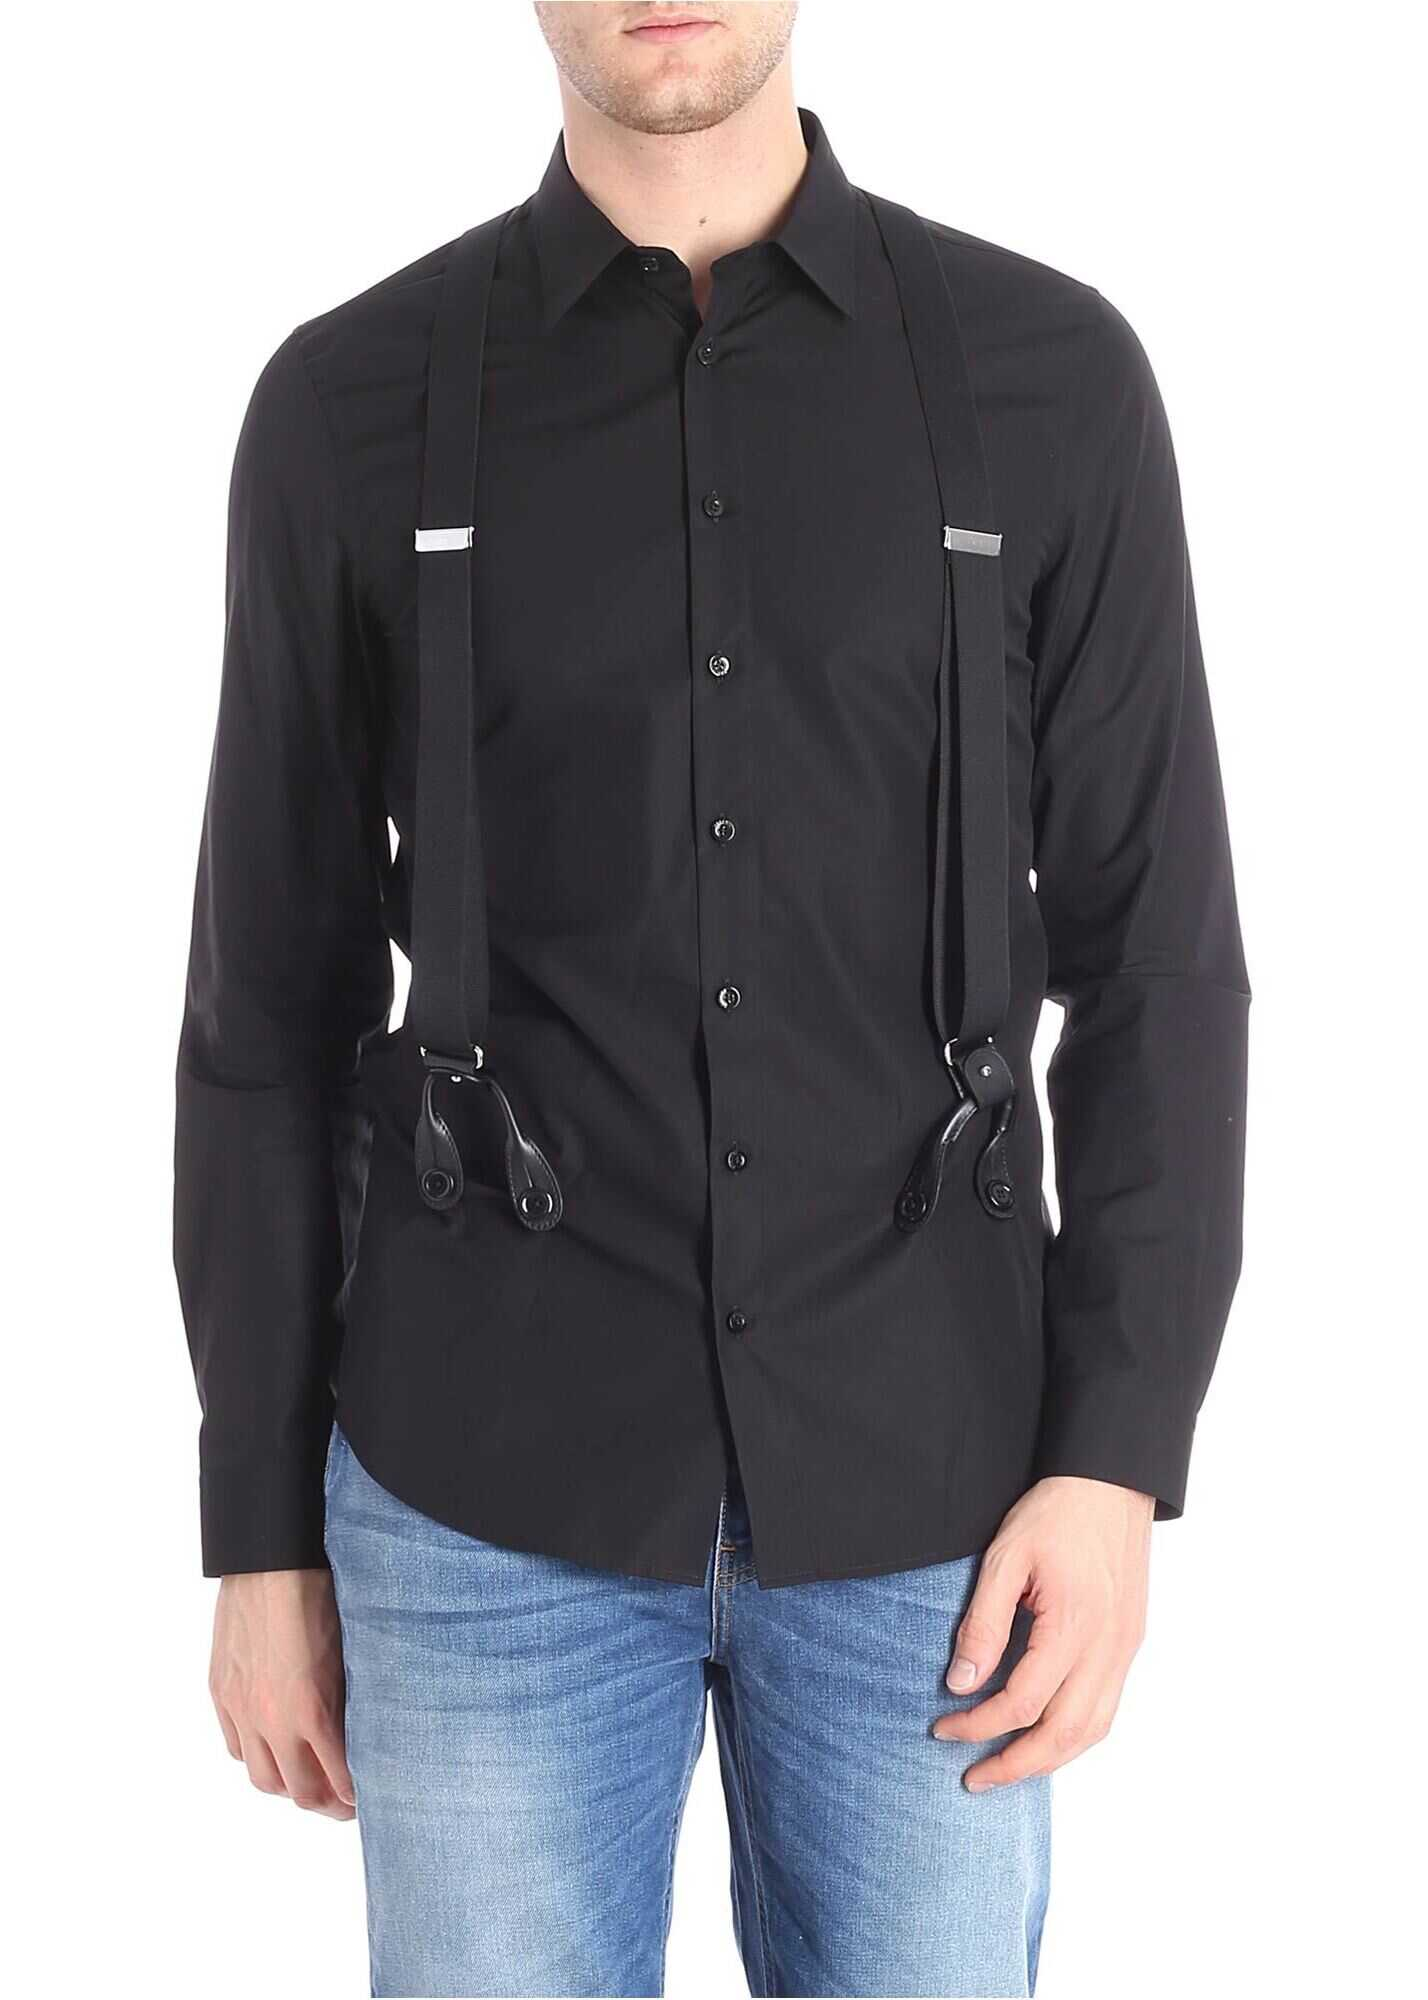 Moschino Black Shirt With Braces Black imagine